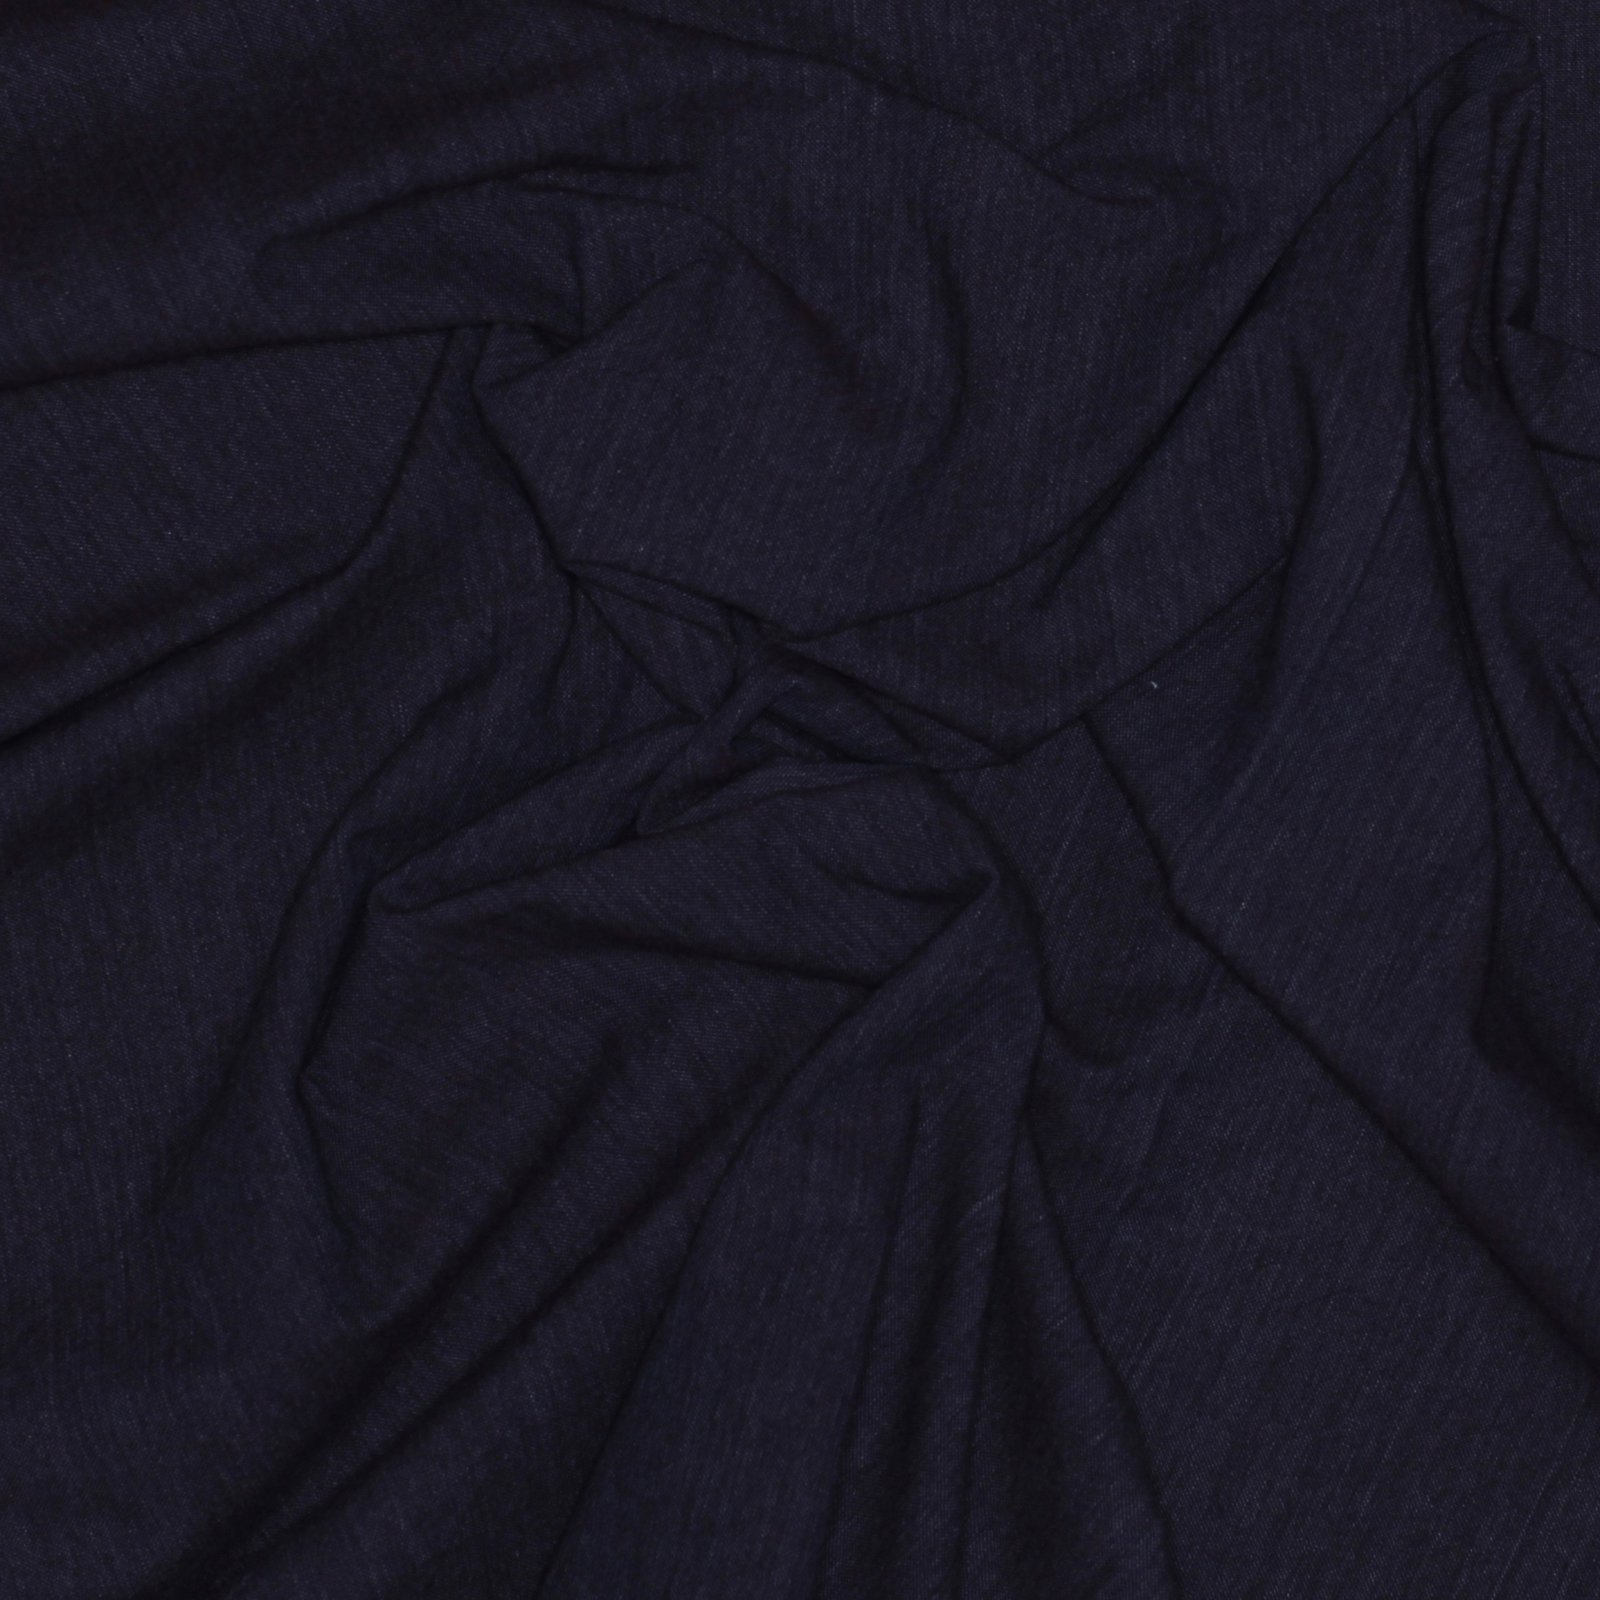 Yarn Dyed Leathered Oxford - Plum Japanese Cotton